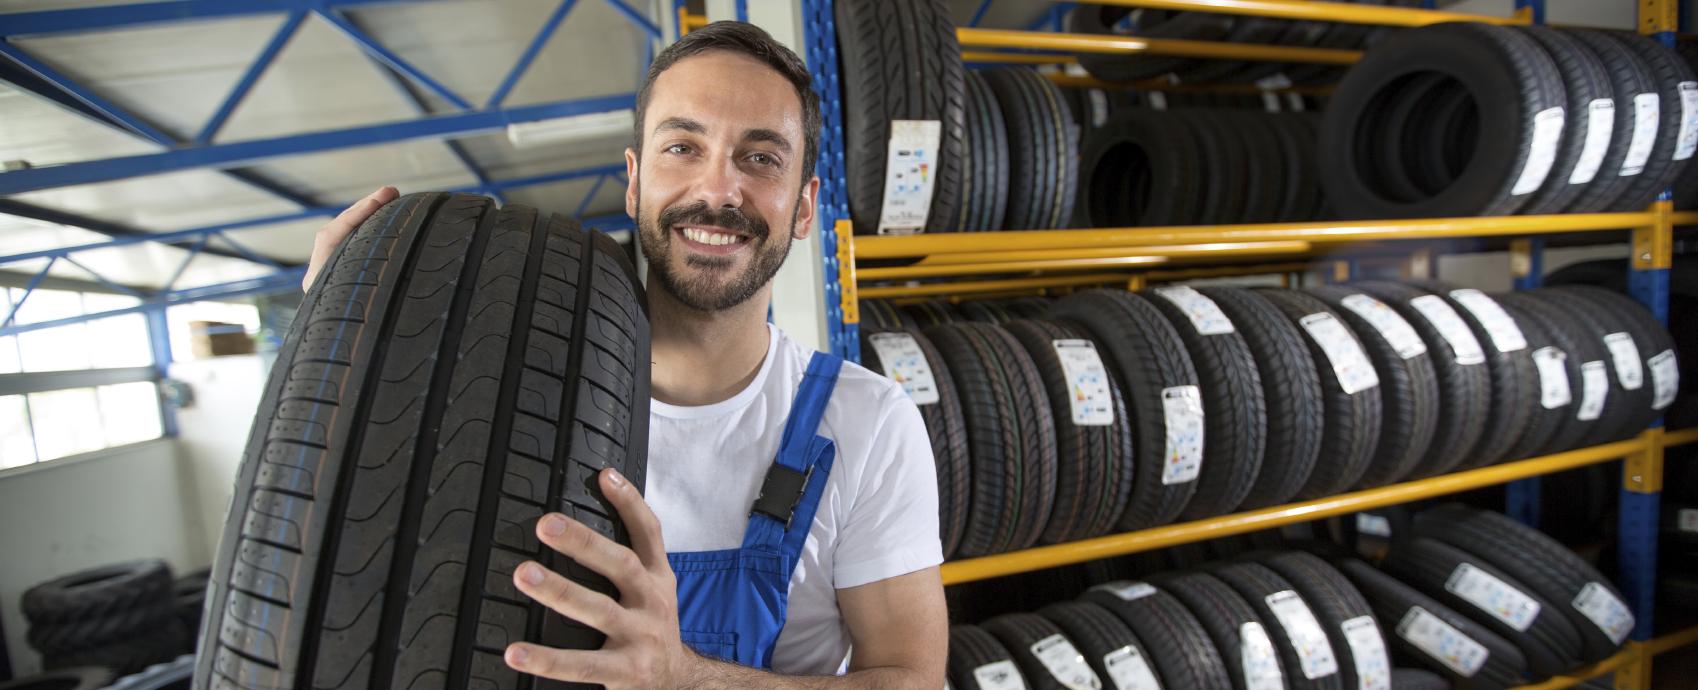 Why Buy Tires at Nissan of Elk Grove?